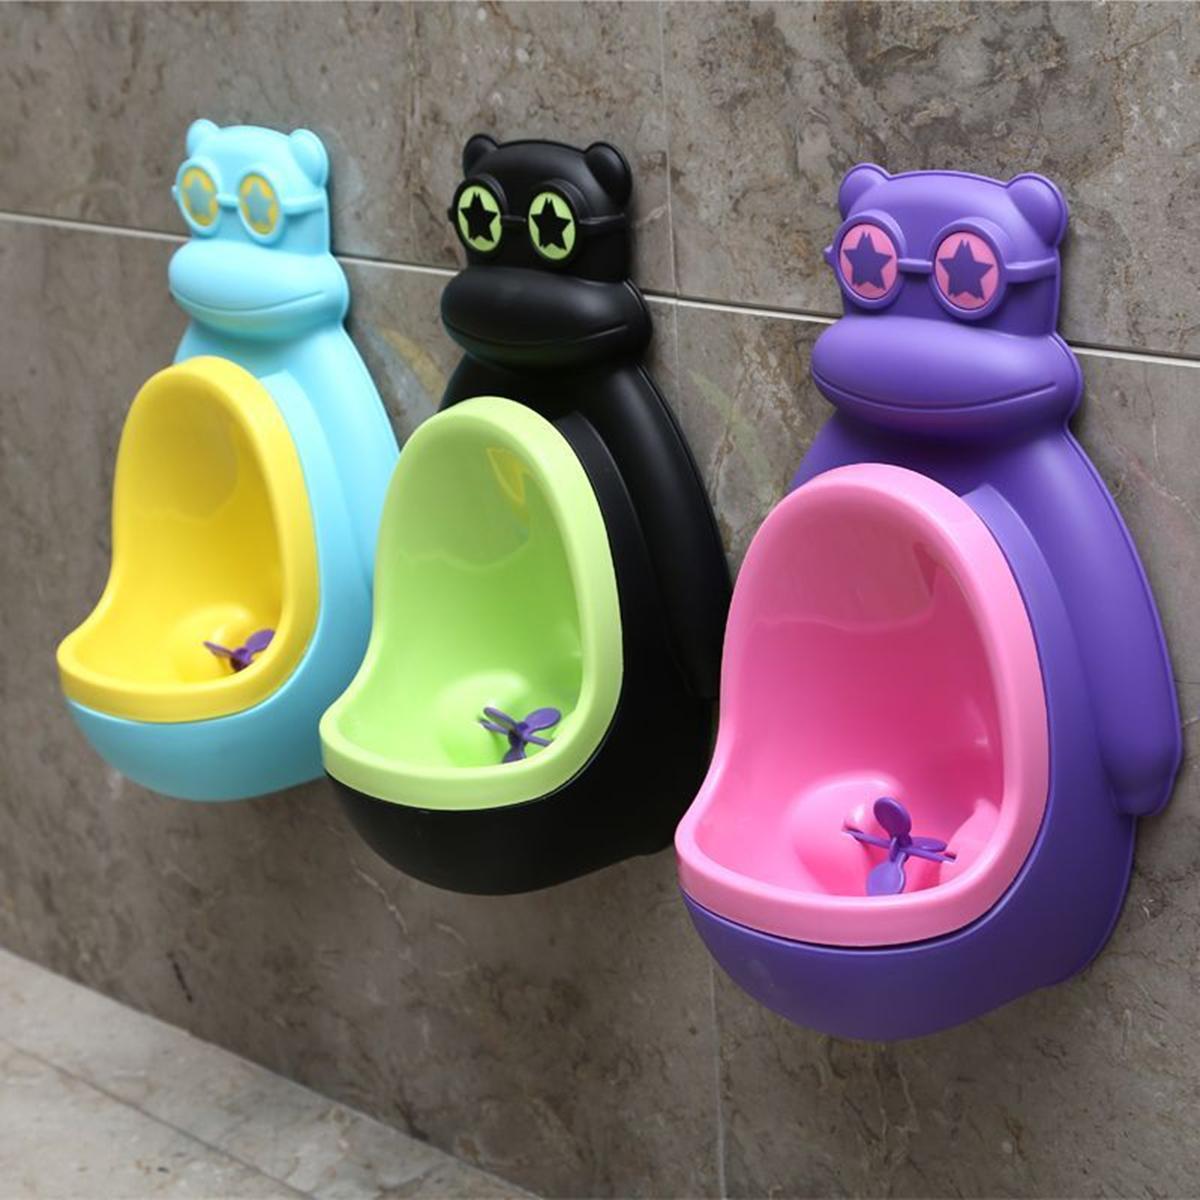 Baby Boys Potty Toilet Kids Toddler Urinal Bathroom Hanging Pee Trainer